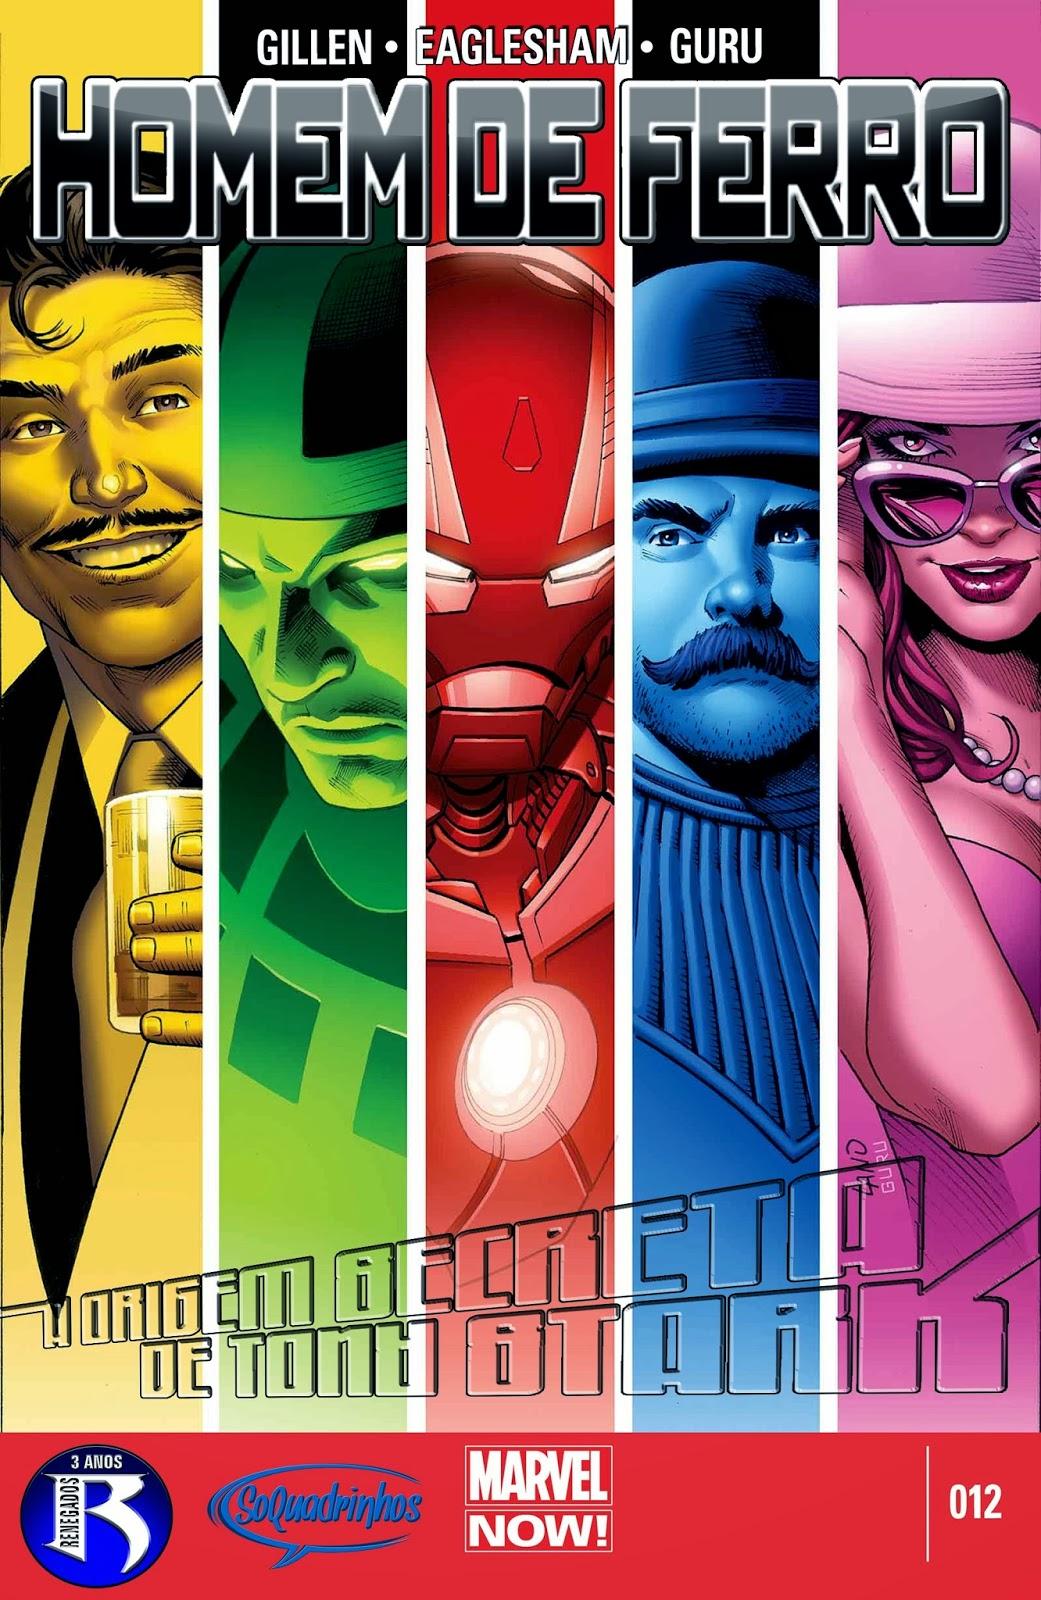 Nova Marvel! Homem de Ferro v6 #12